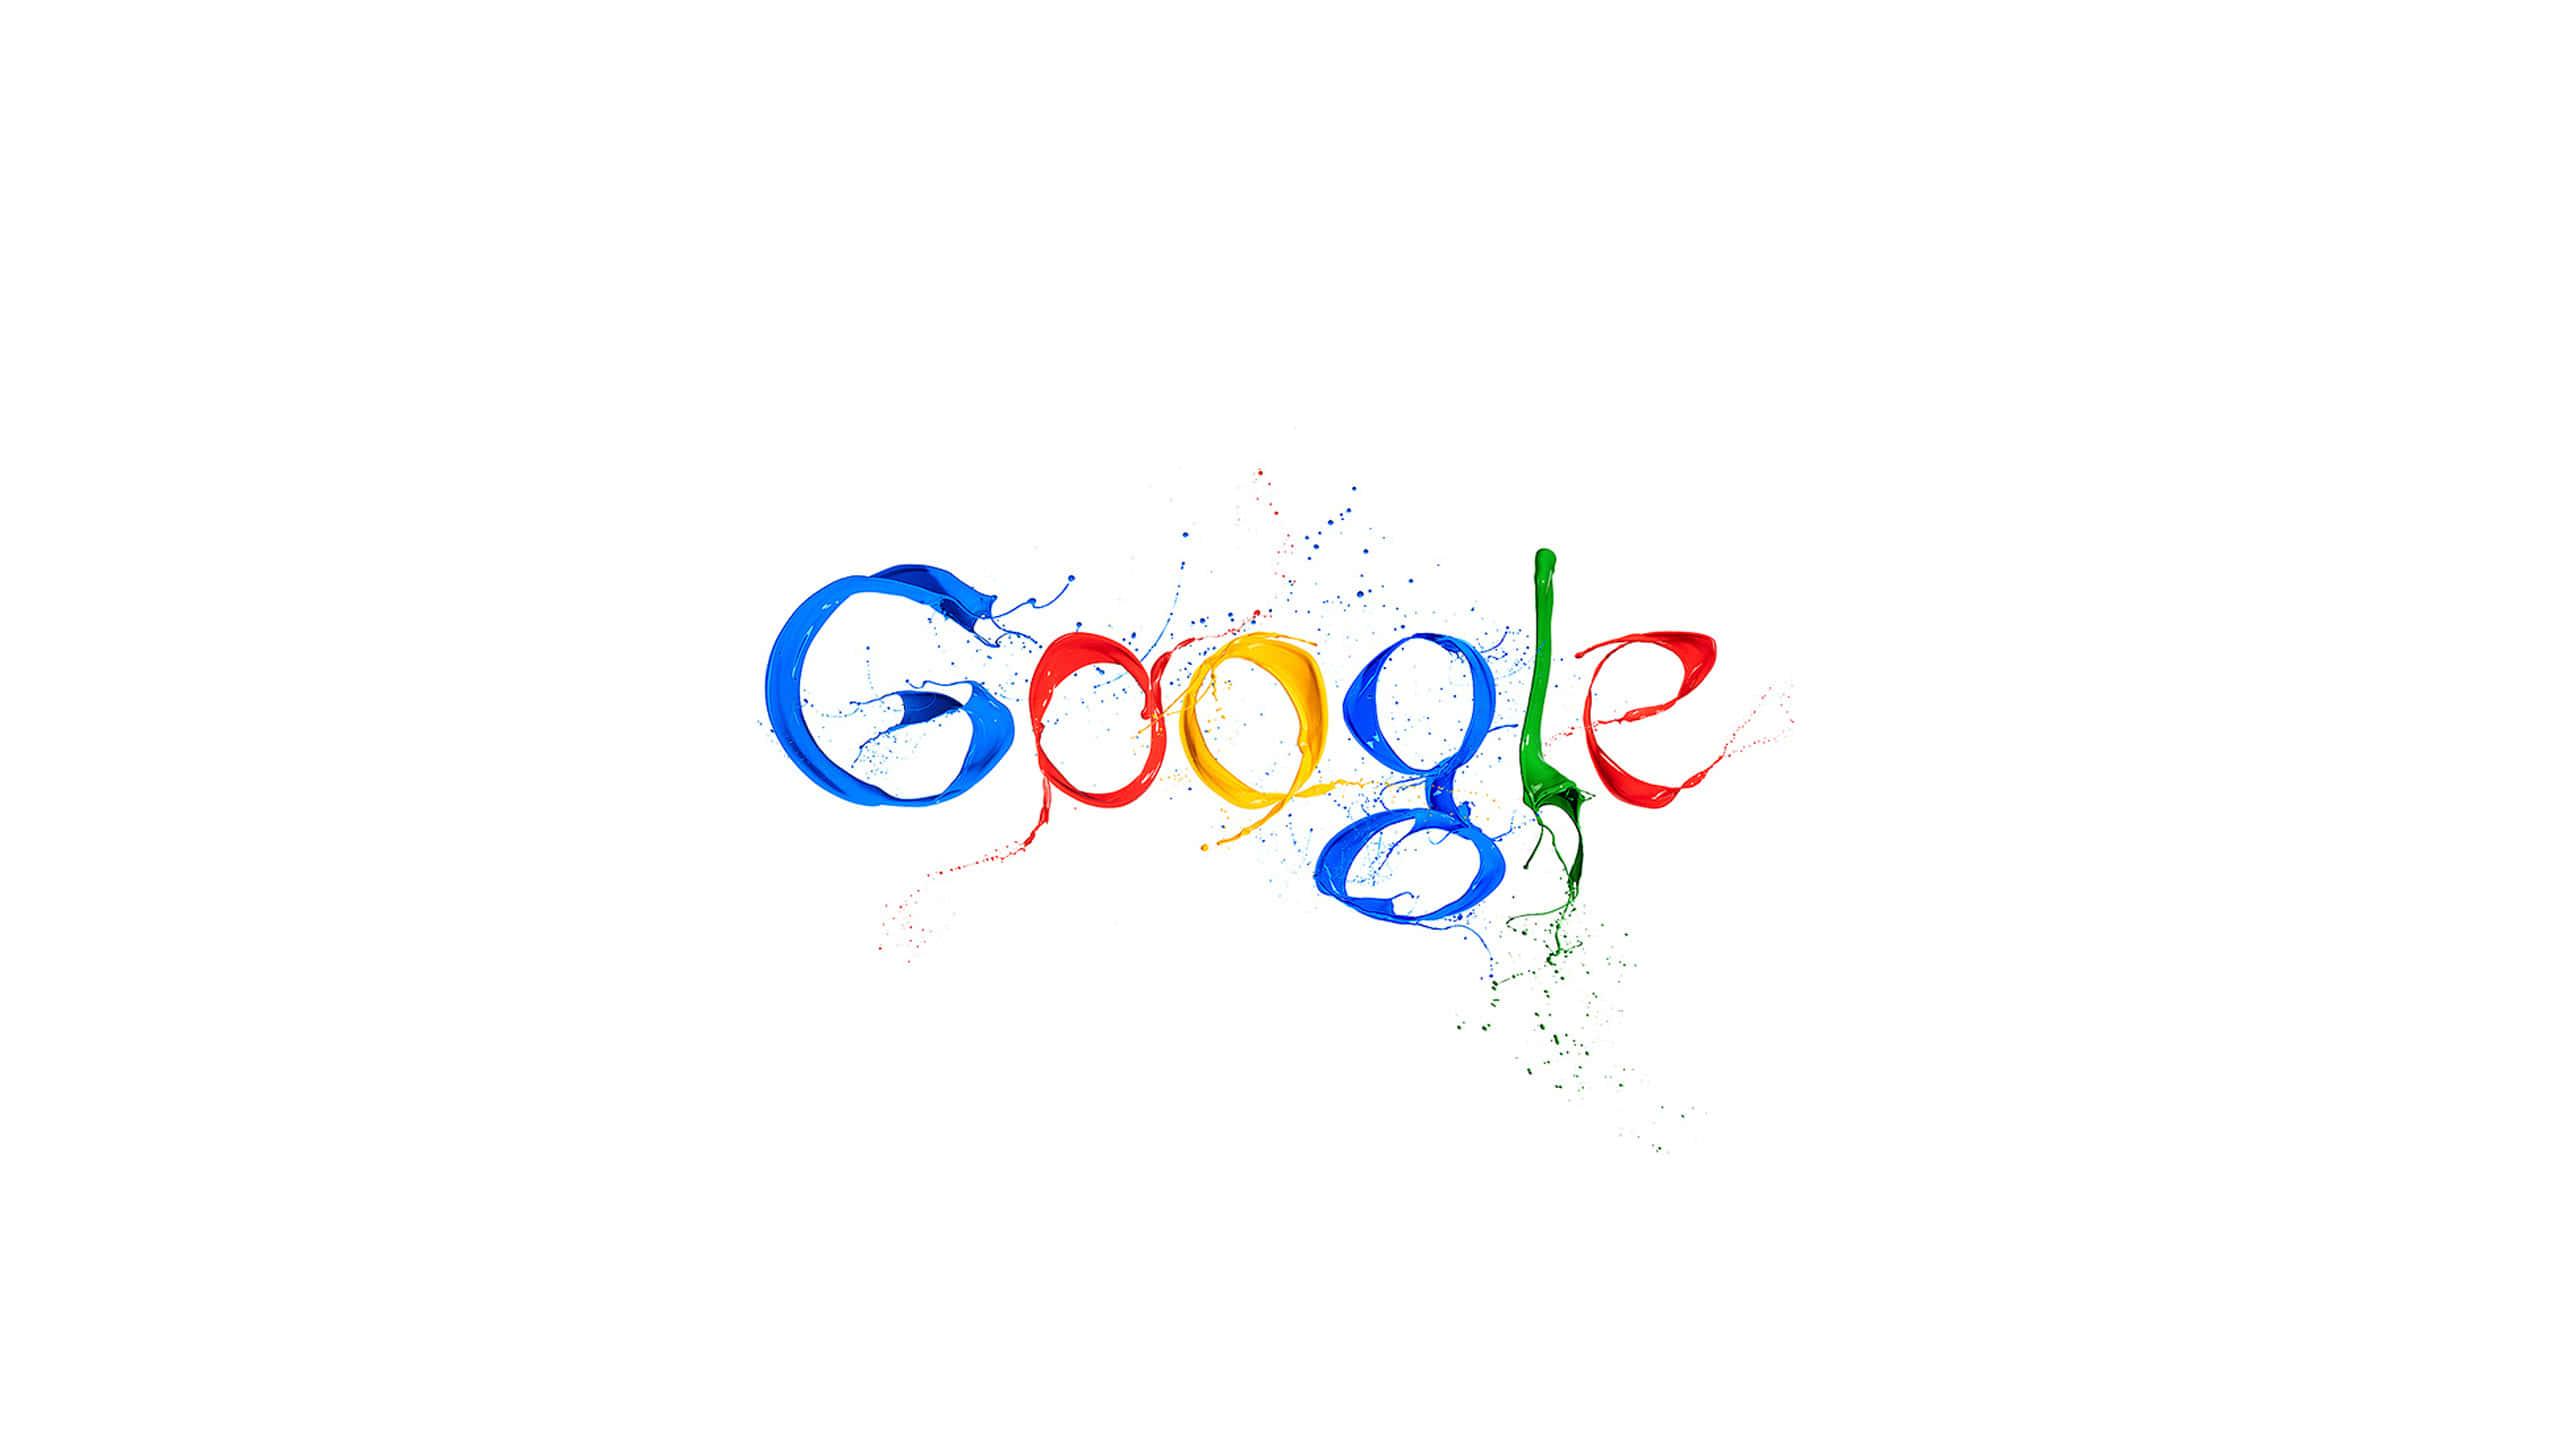 google logo paint wqhd 1440p wallpaper